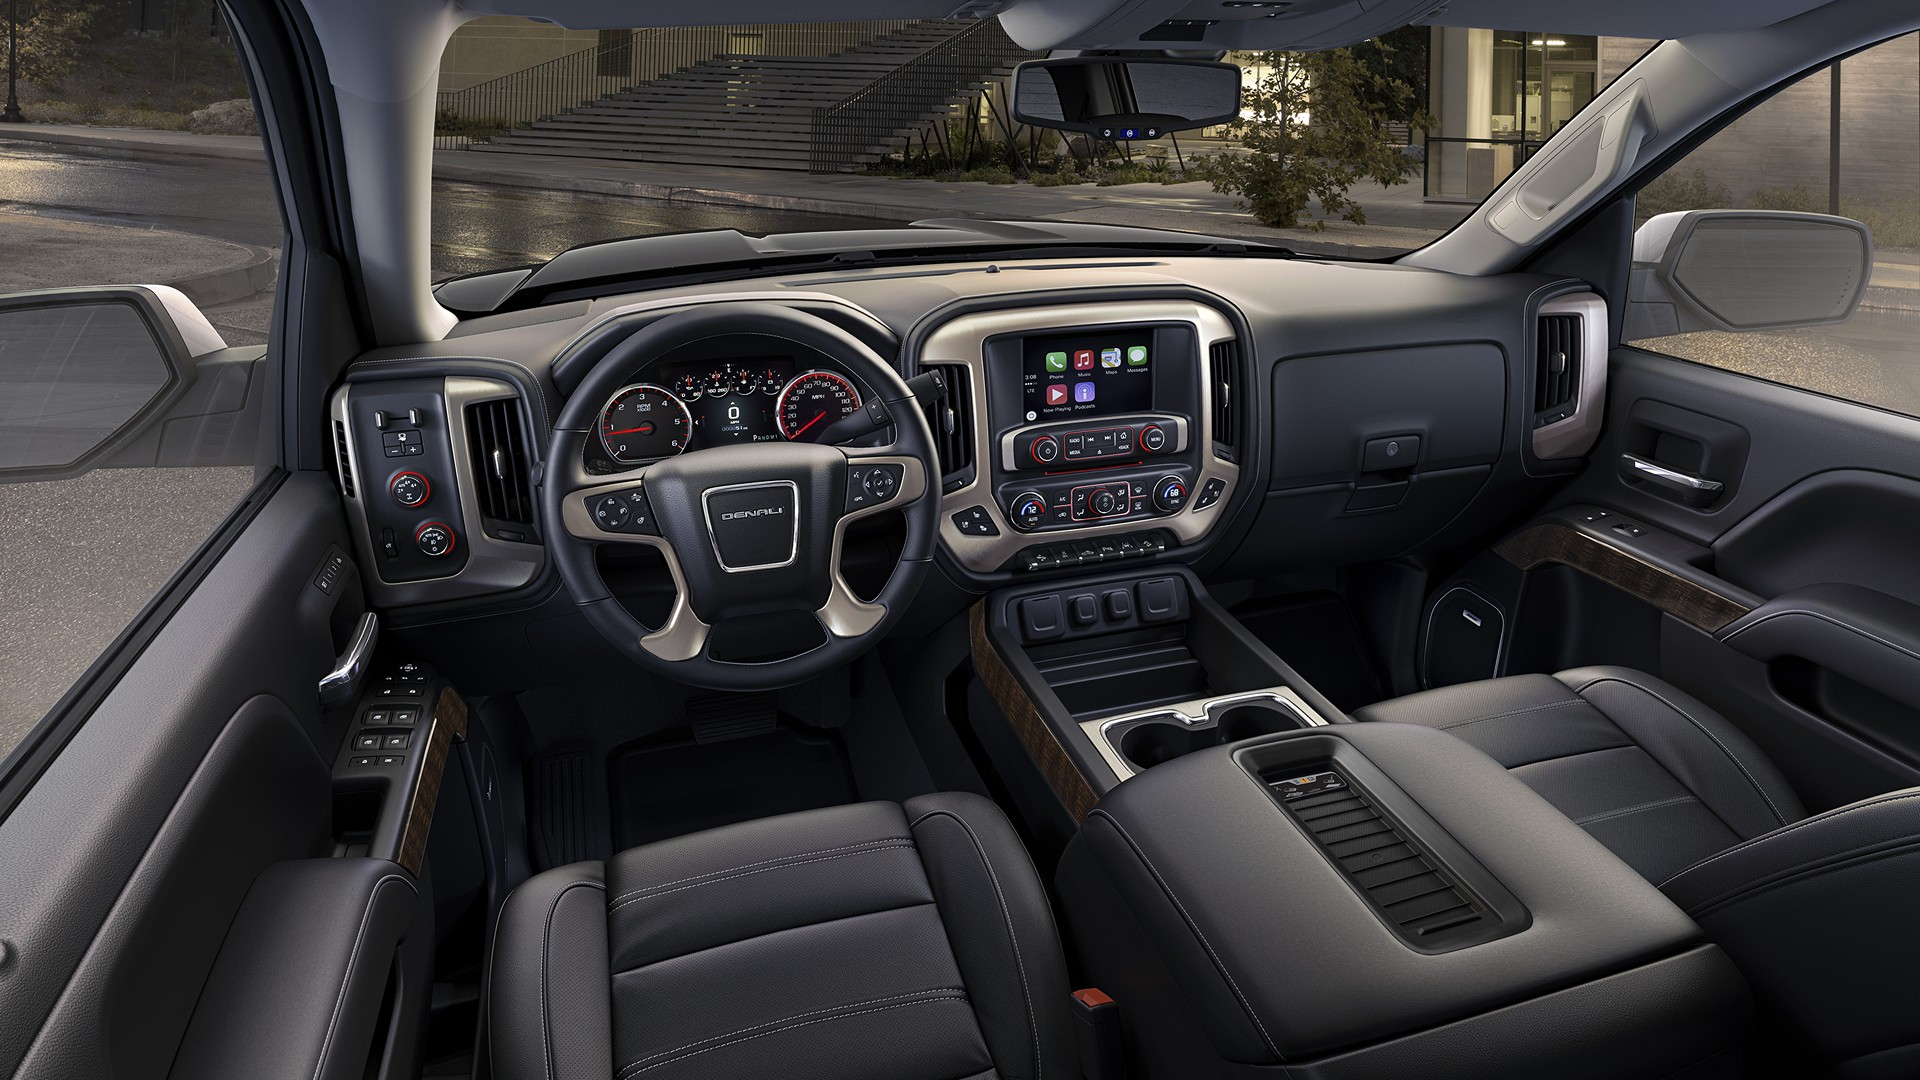 2016 GMC Sierra Denali Ultimate © General Motors